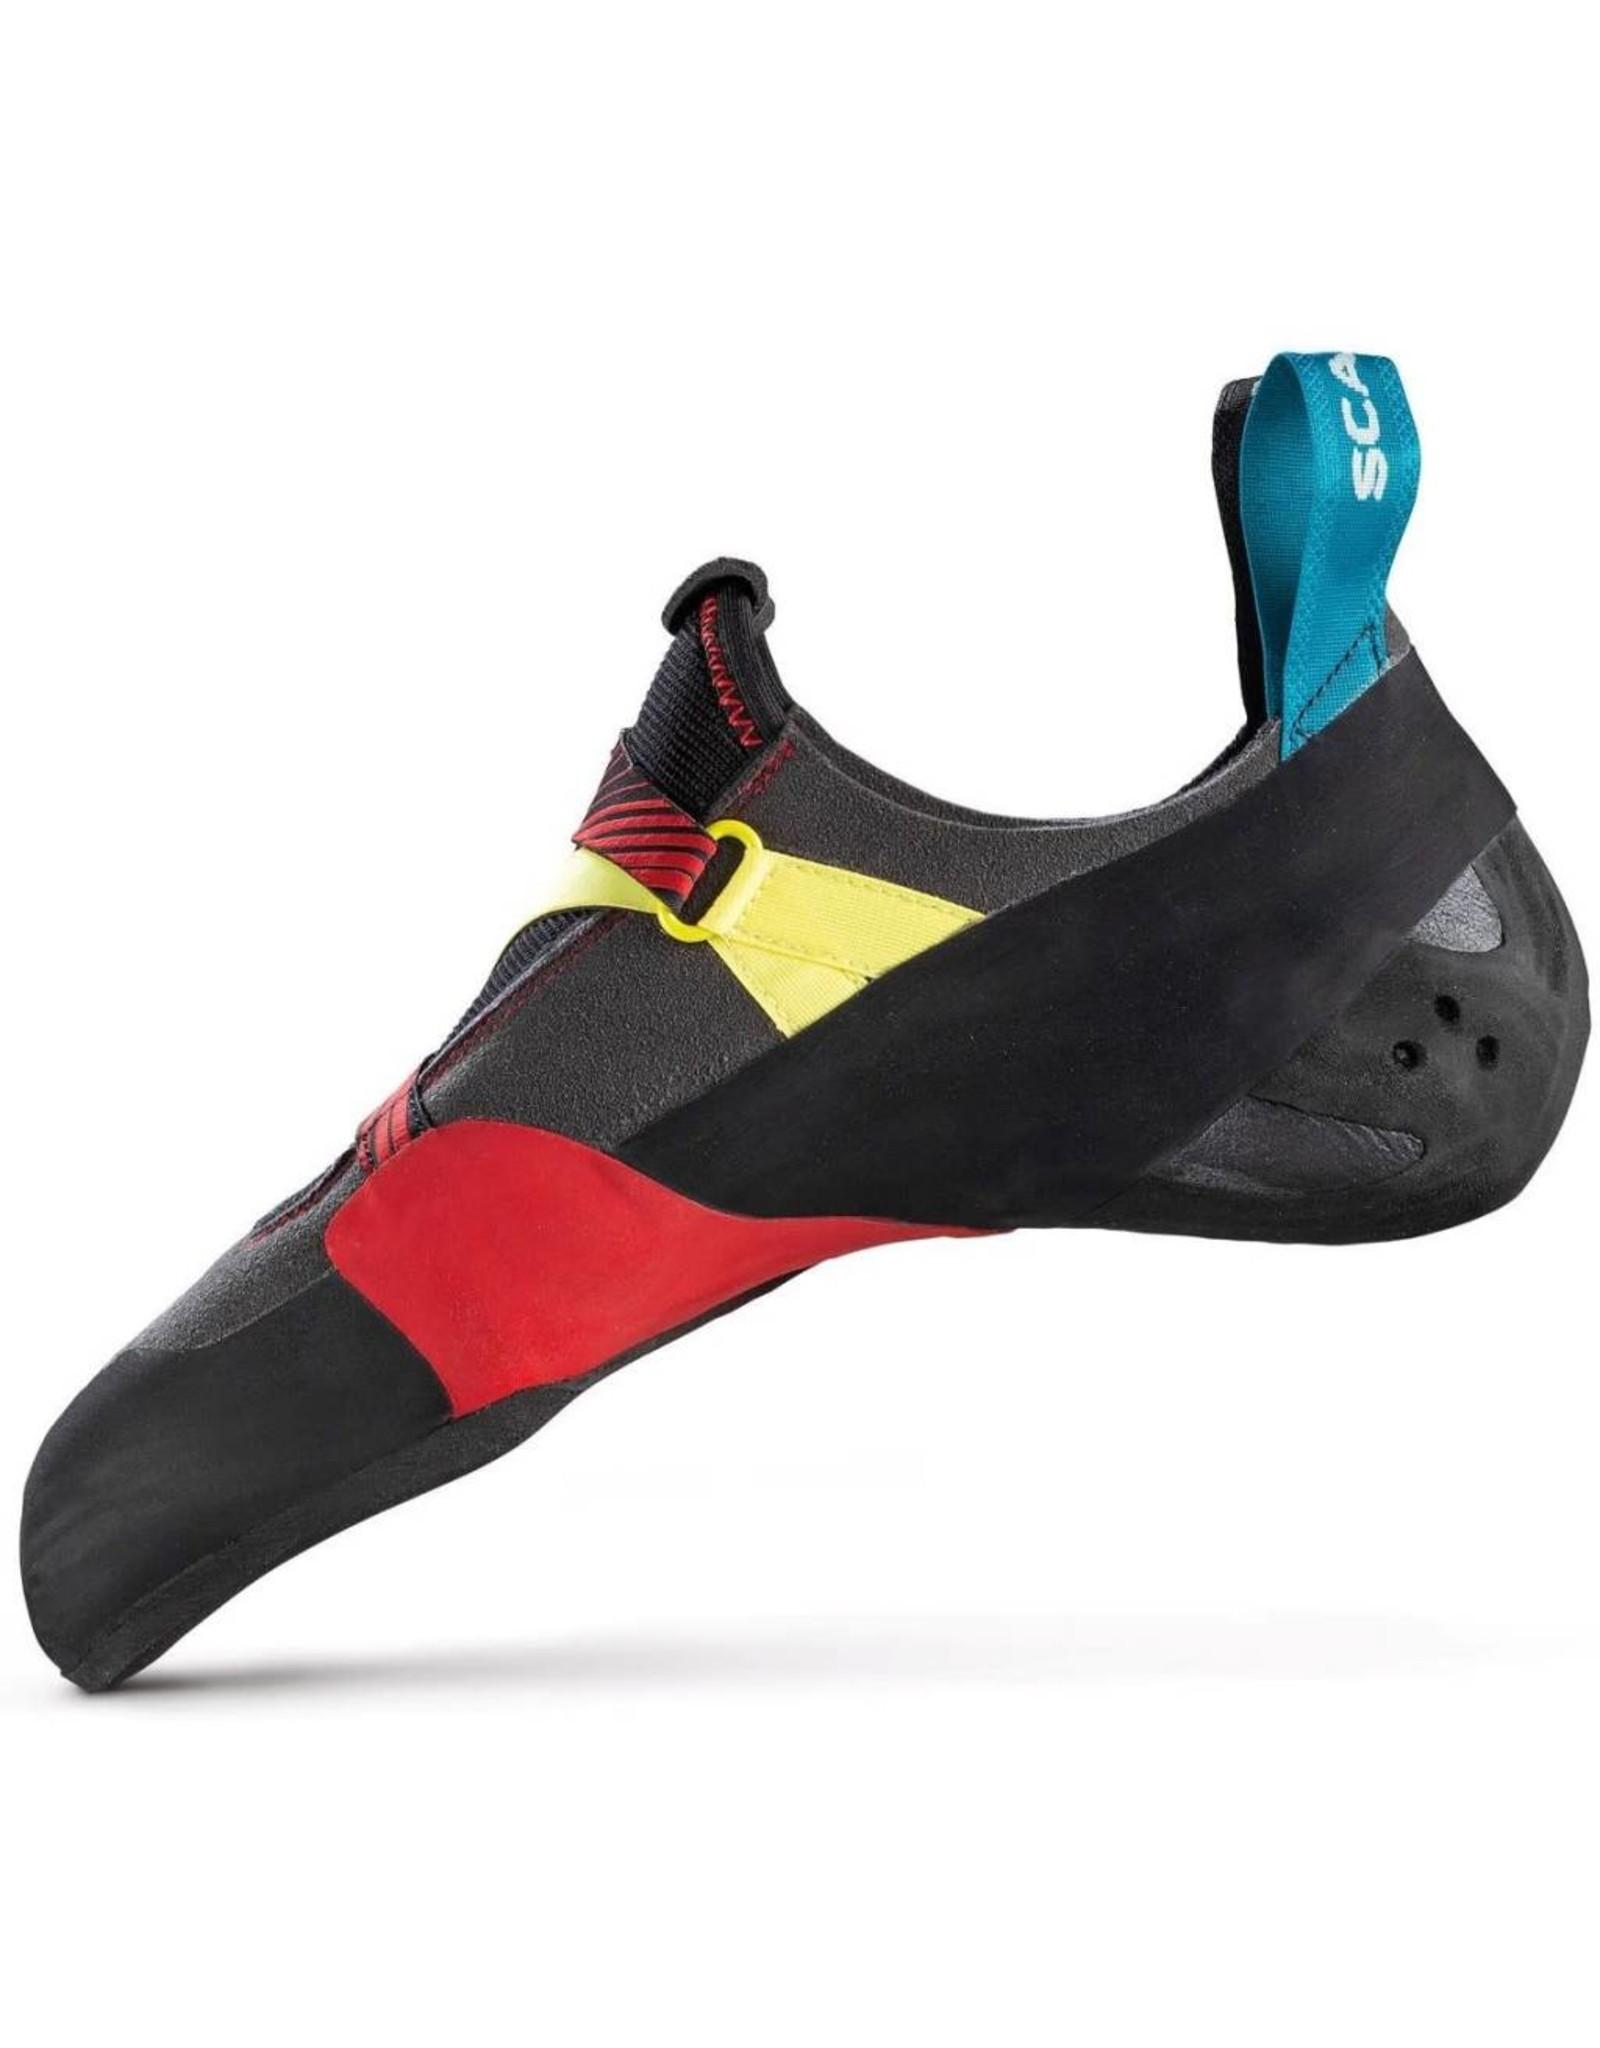 Scarpa Scarpa Arpia Climbing Shoe